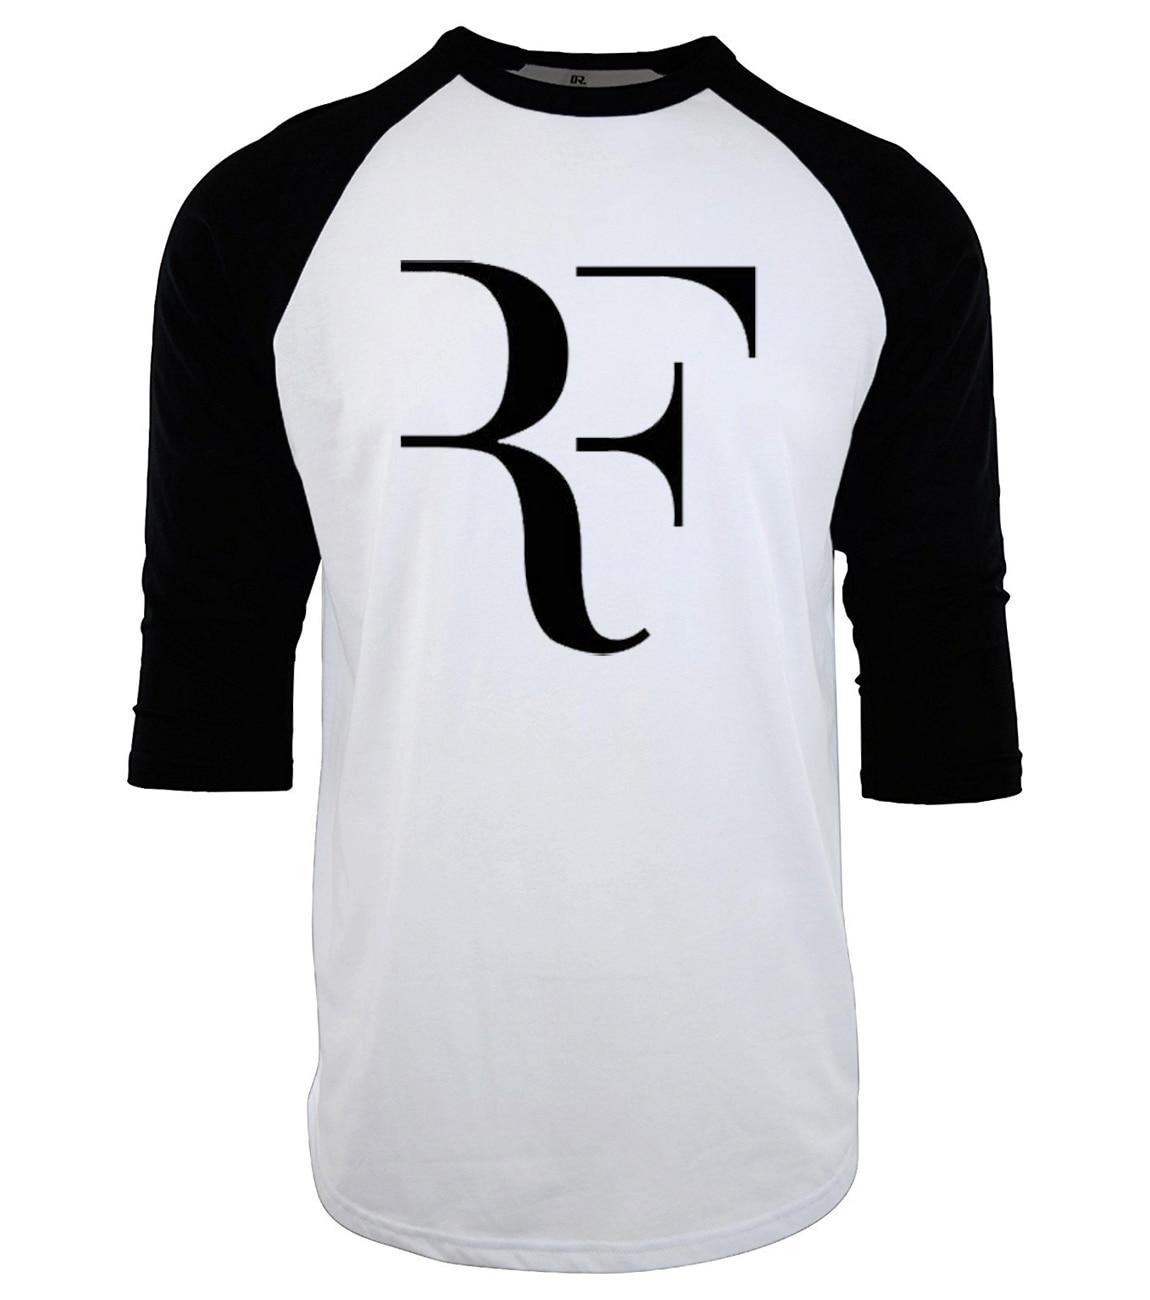 2019  raglan three-quarter Sleeve Tee Shirt homme Mens funny  t shirts kpop mma fitness cotton camisetas